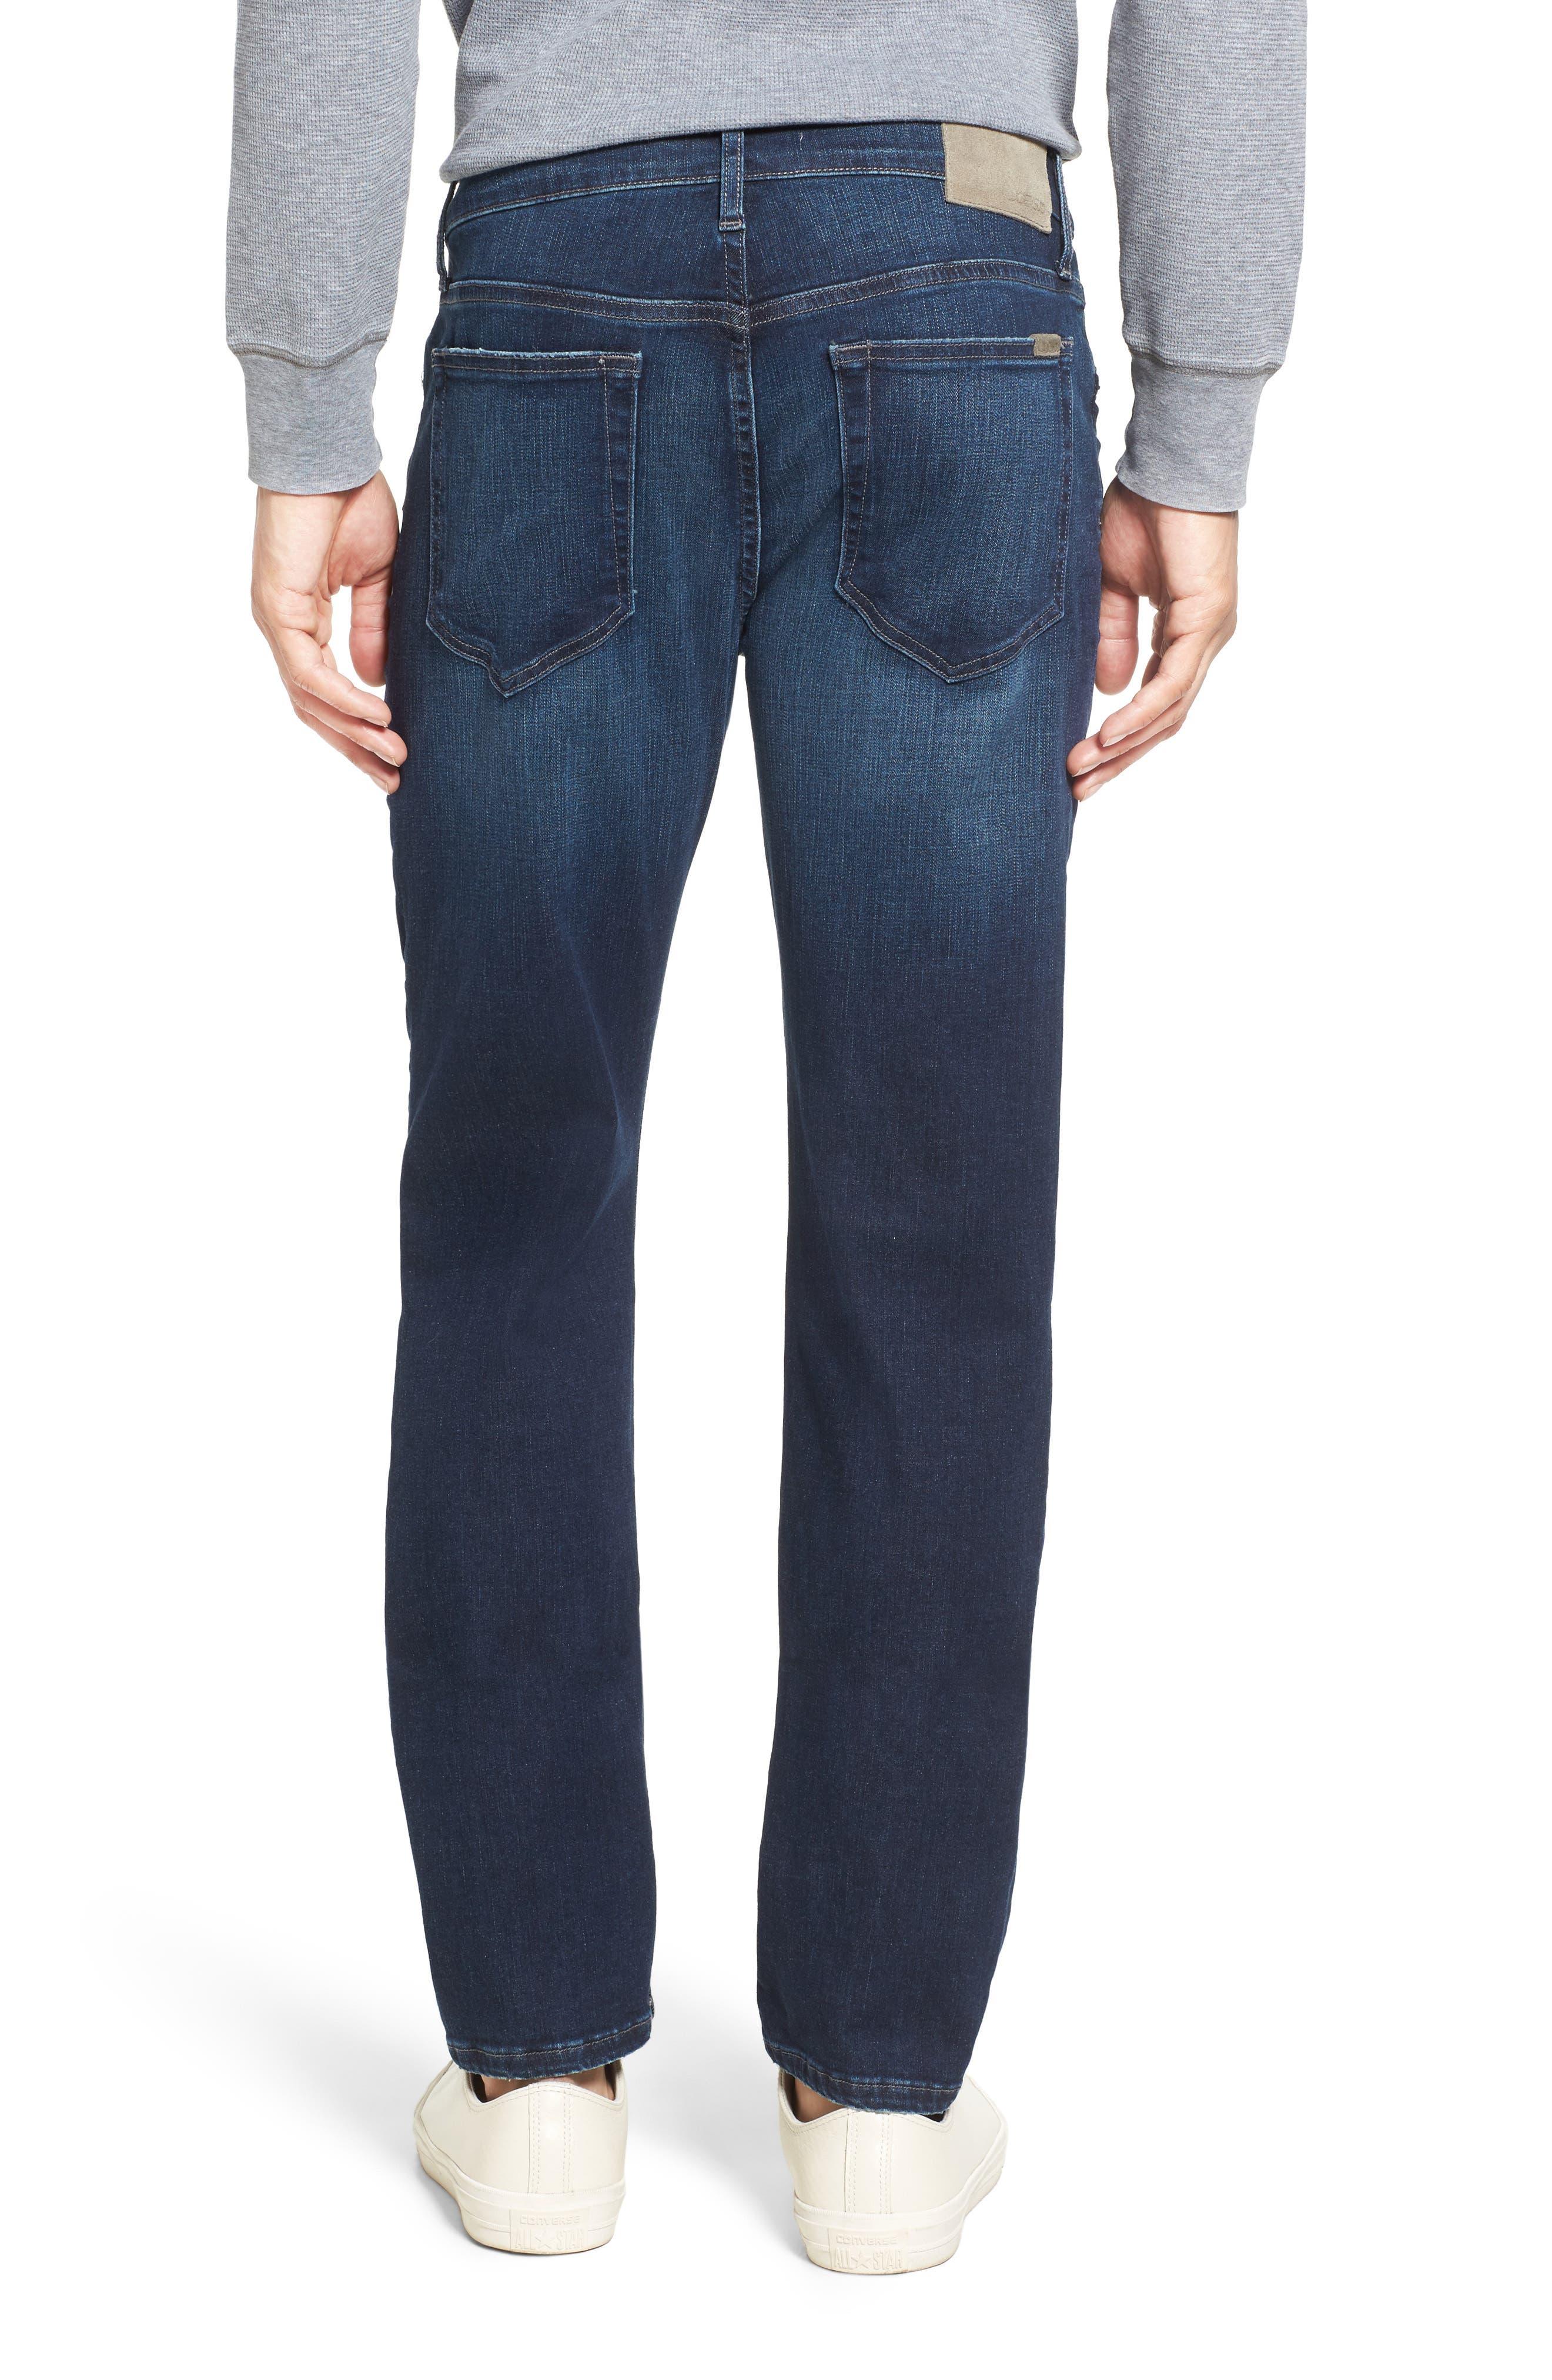 Kinetic Slim Fit Jeans,                             Alternate thumbnail 2, color,                             Aedan